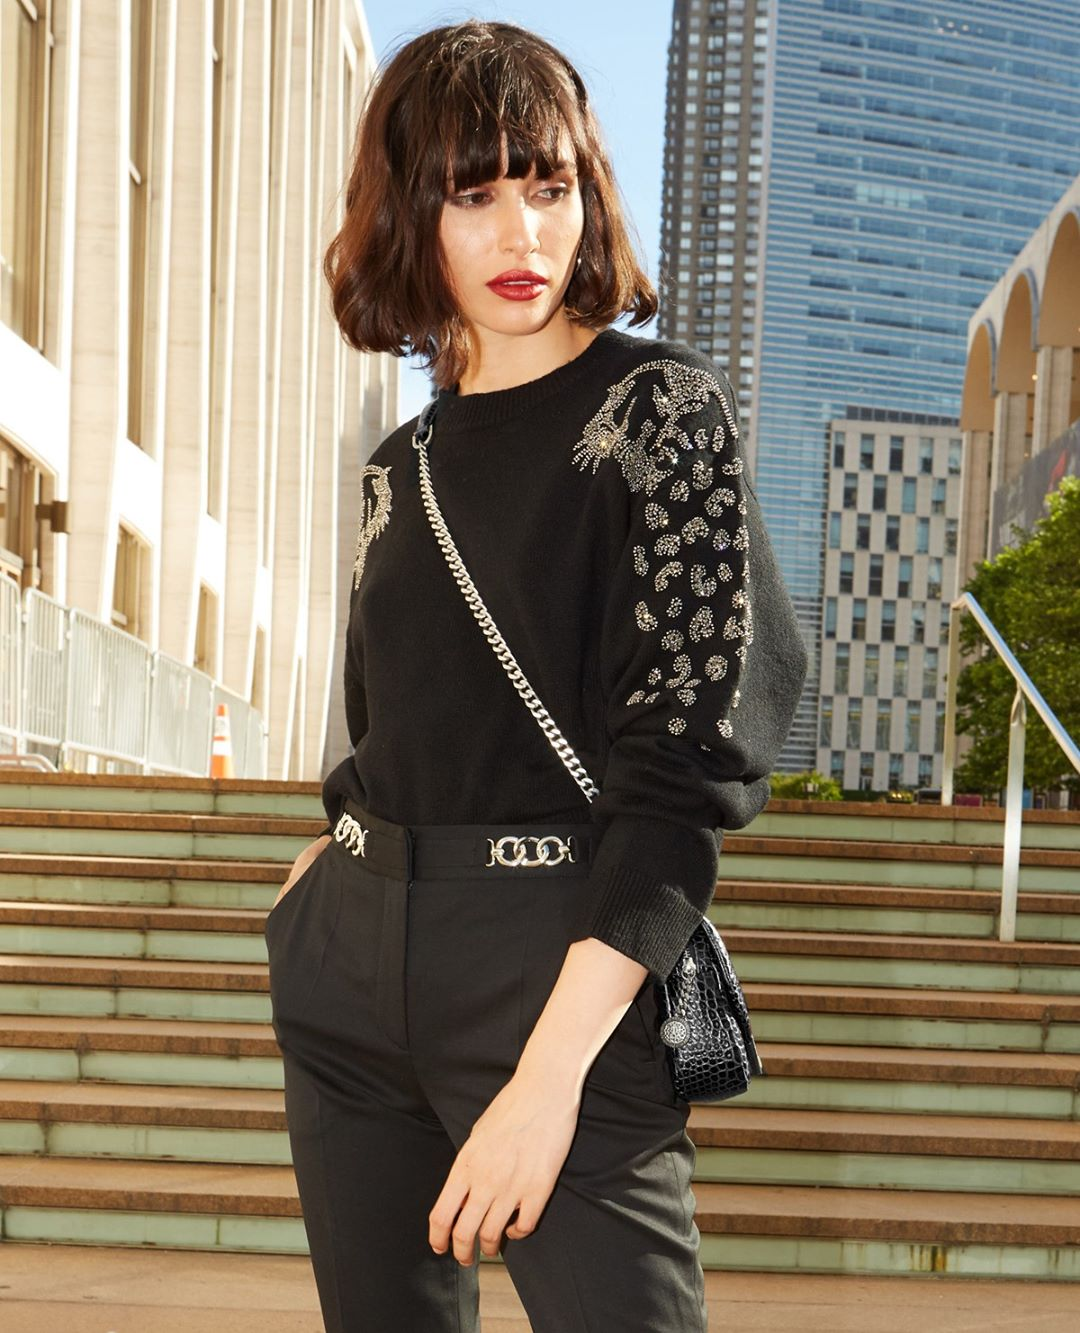 Black formal sweater with rhinestone leopard